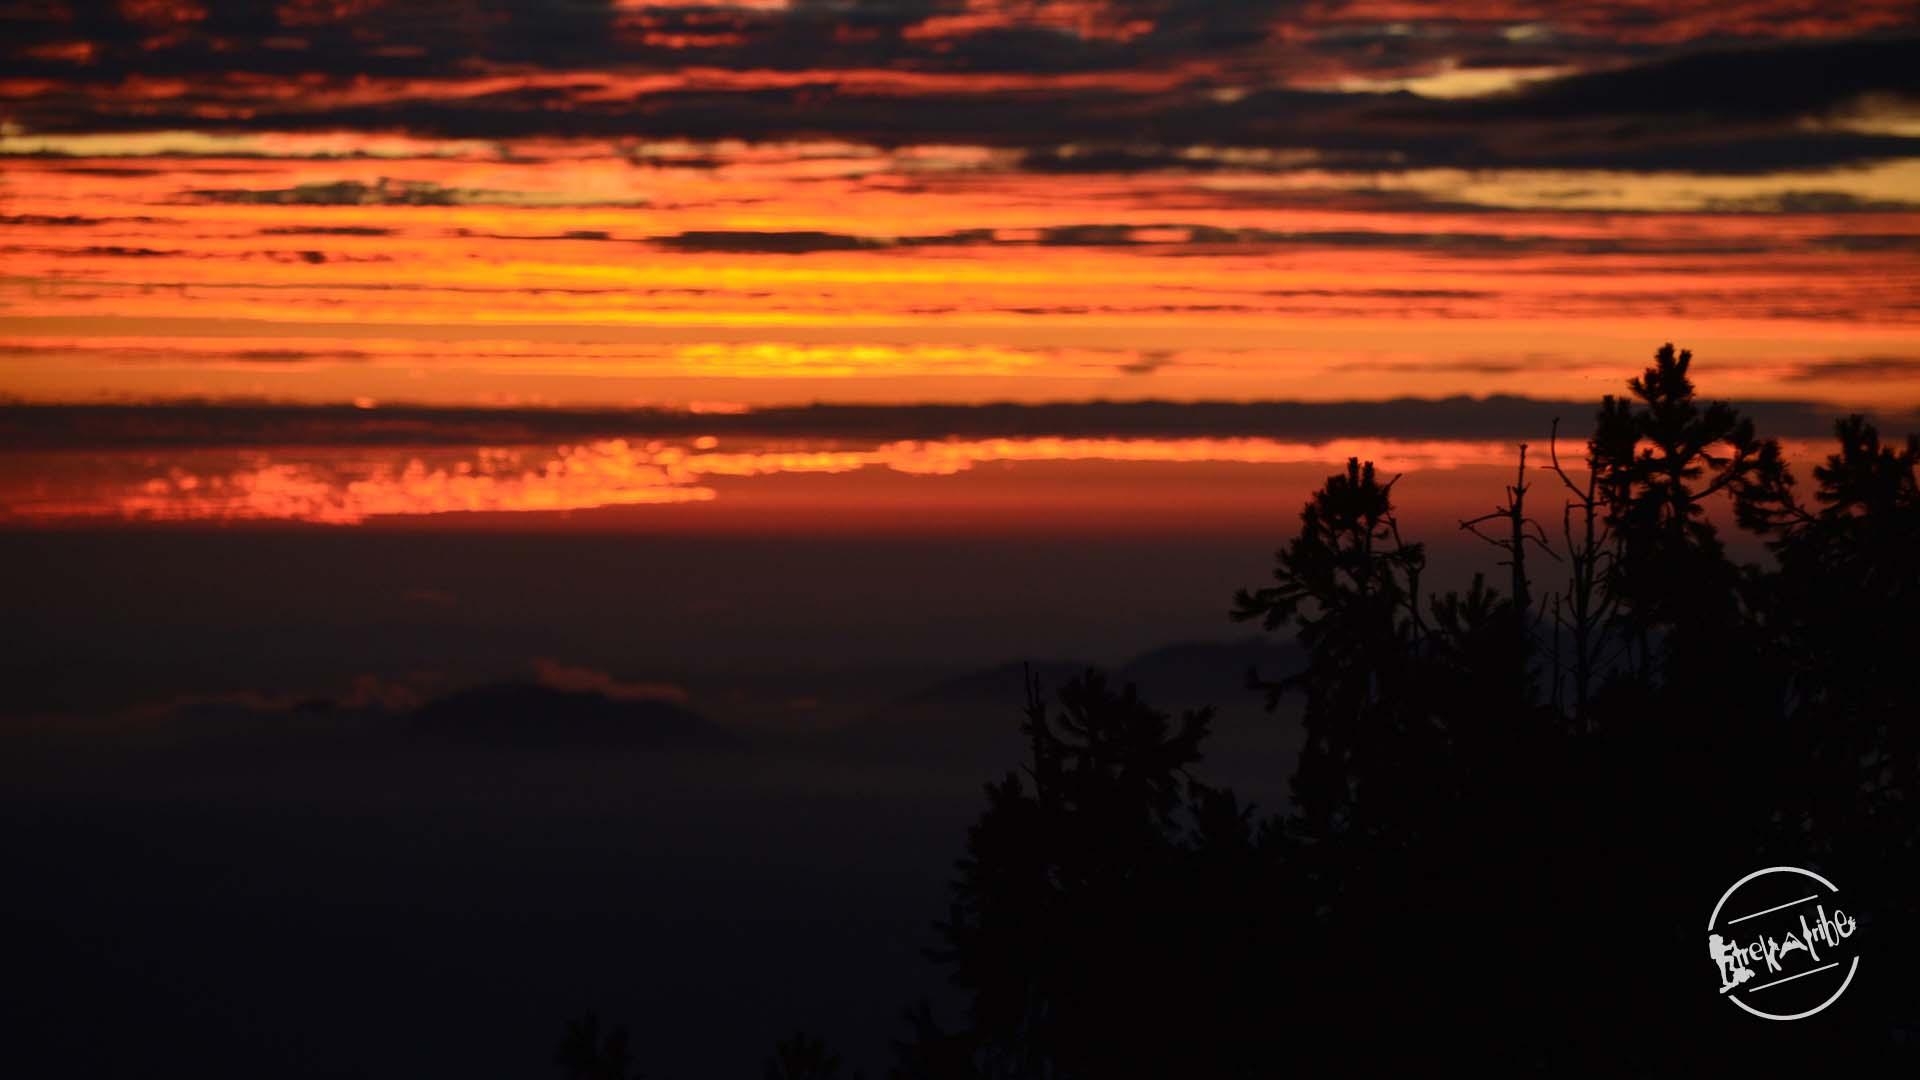 Shali Tibba Trekking - Magnificent Sunset